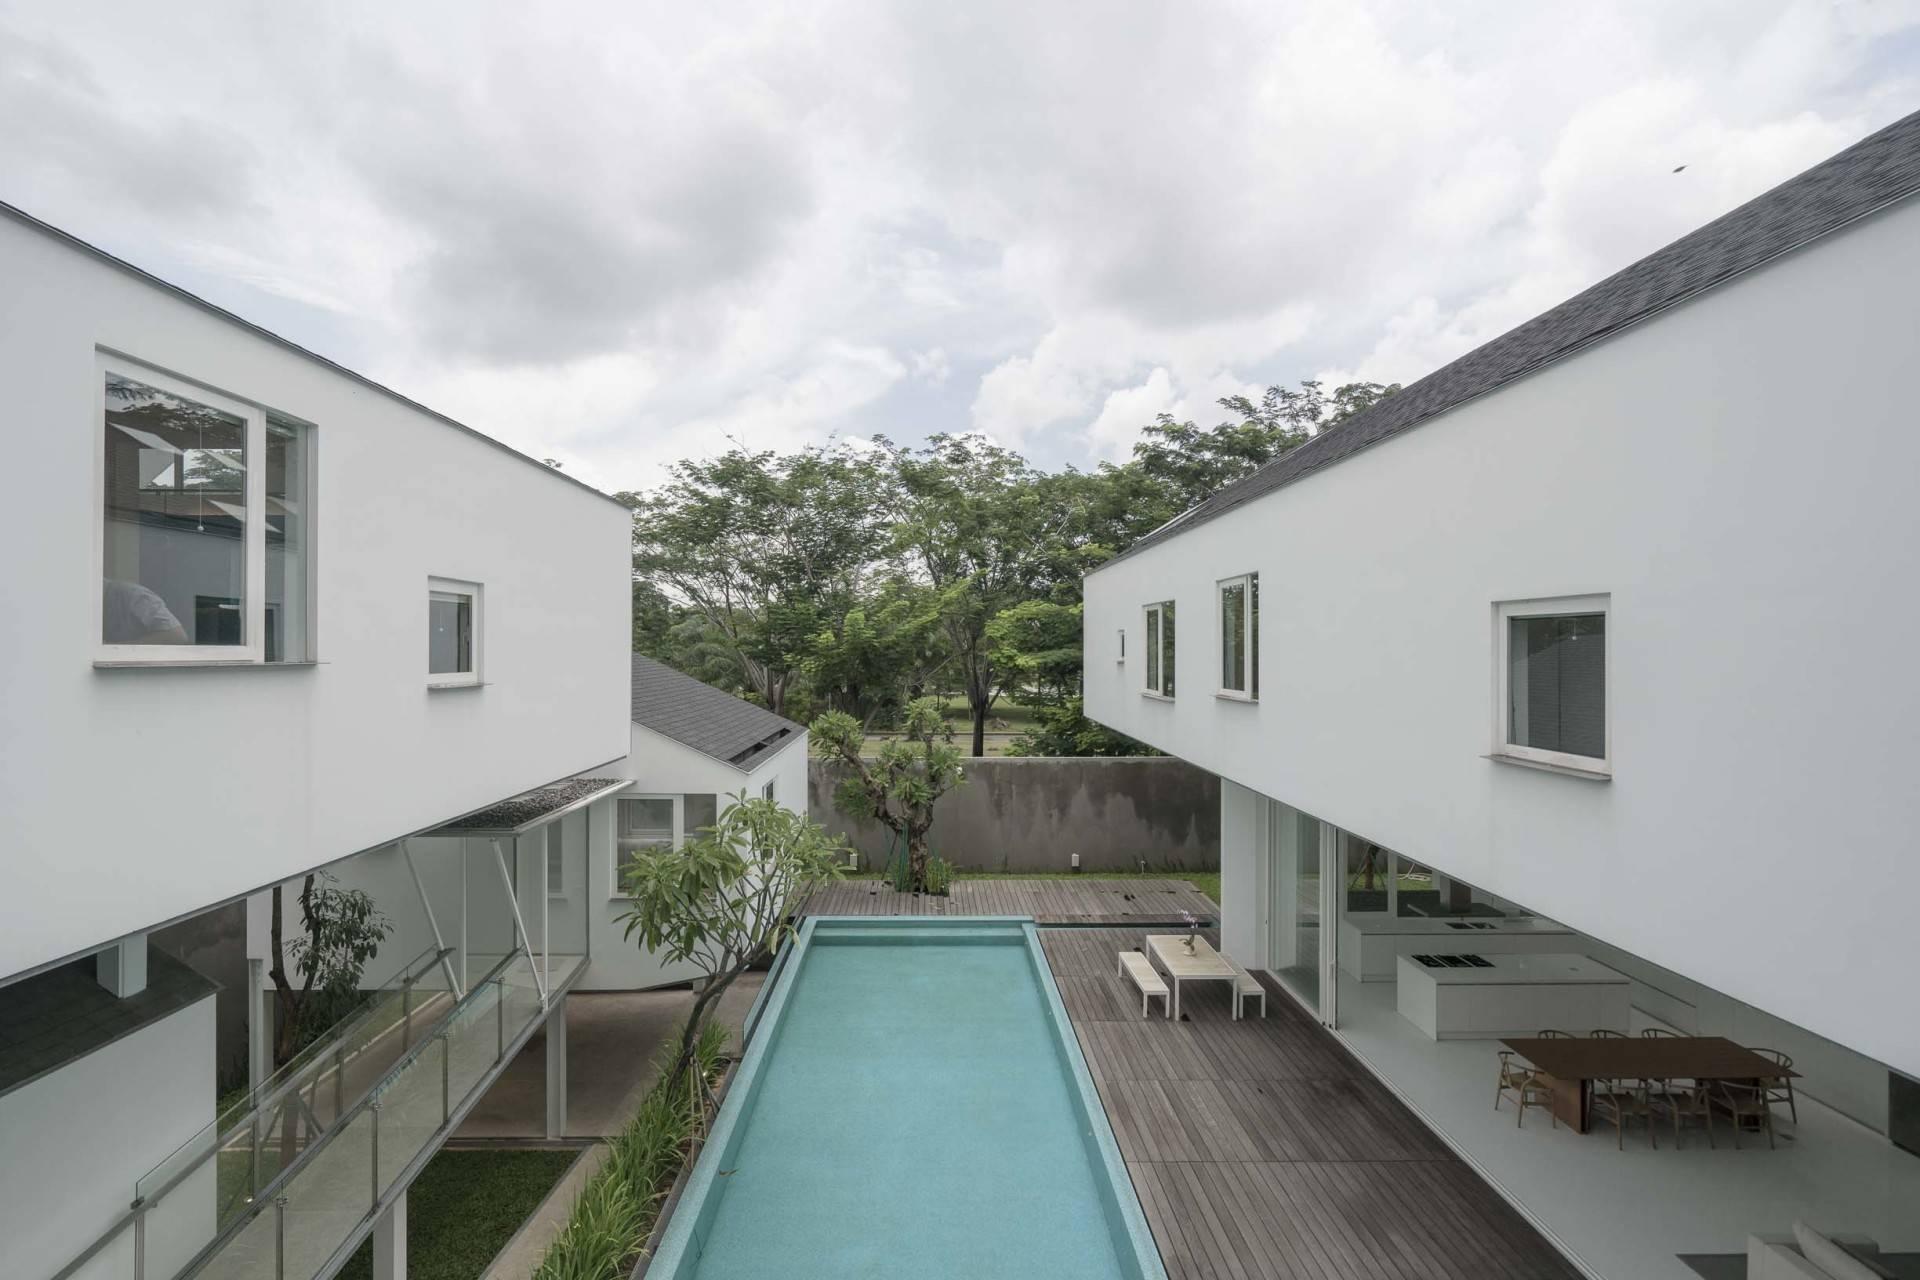 Antony Liu + Ferry Ridwan / Studio Tonton Is House Tangerang Tangerang Exterior Details Modern  8187